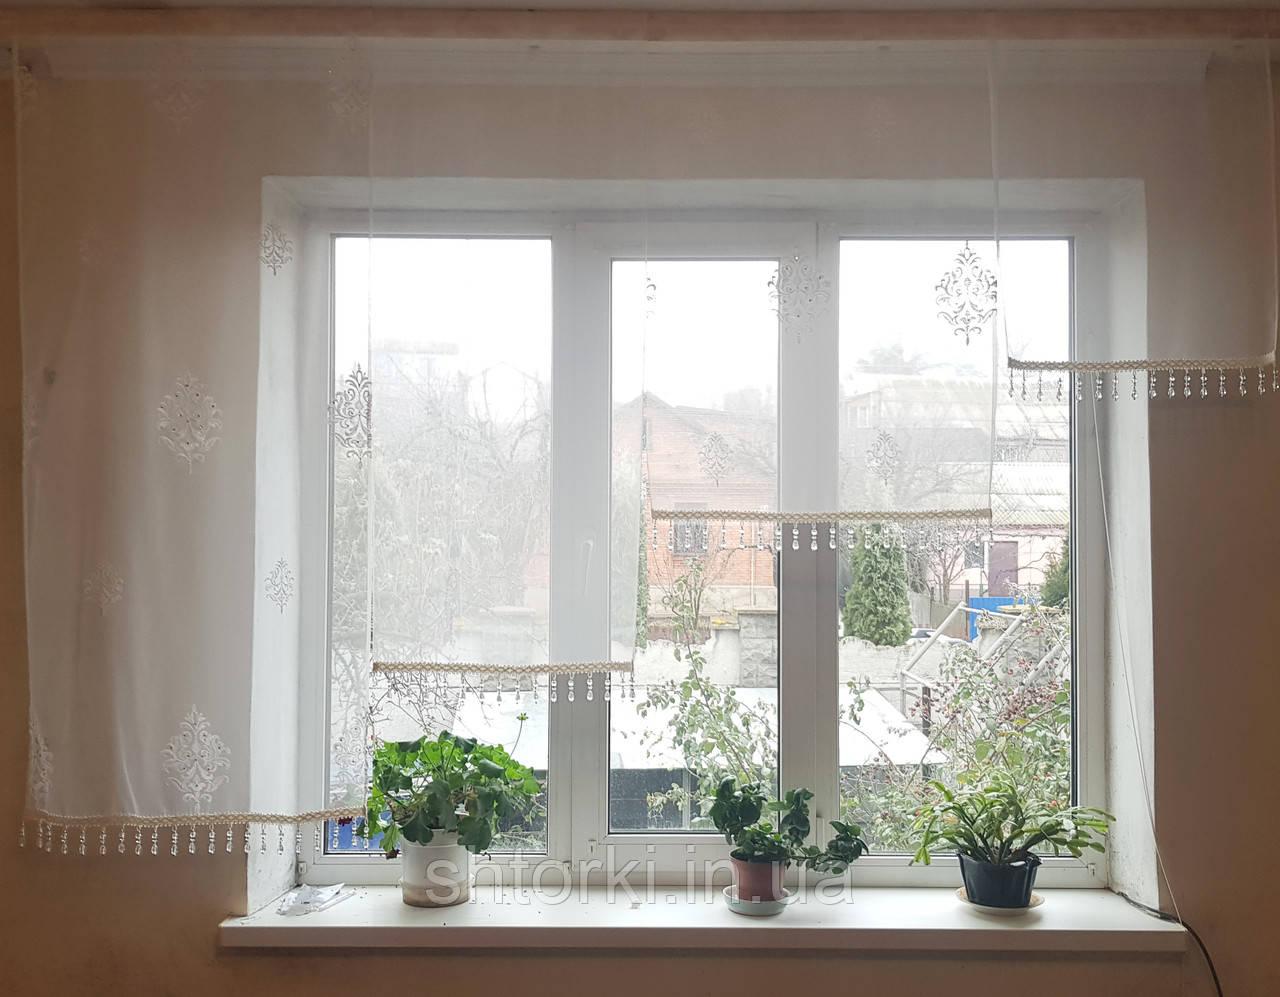 Комплект панелек Коронка со стеклярусом